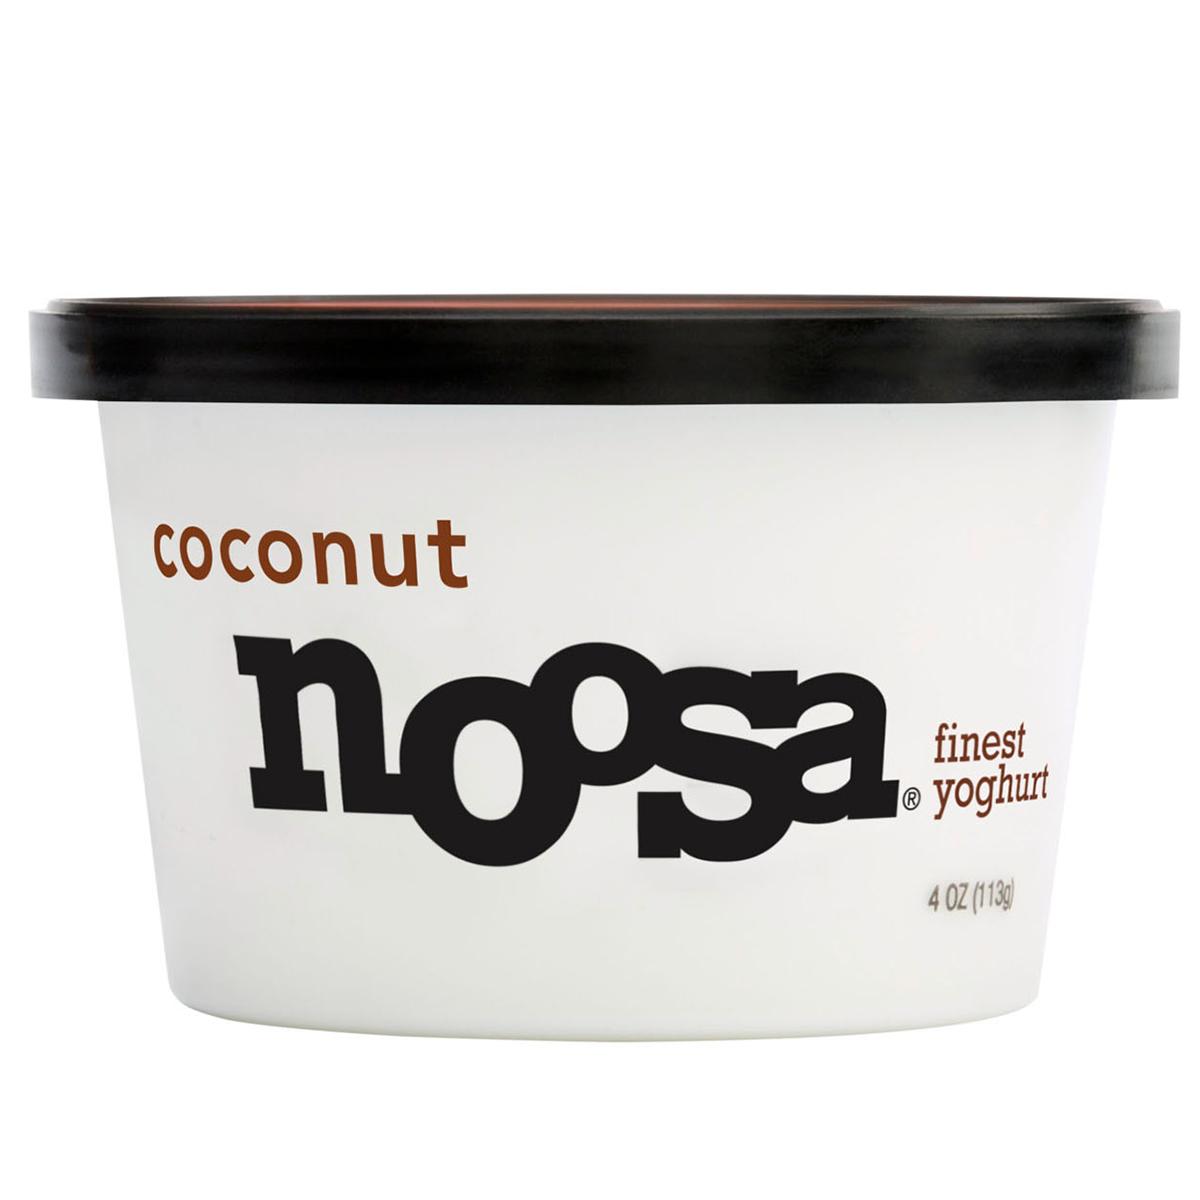 noose coconut yogurt container